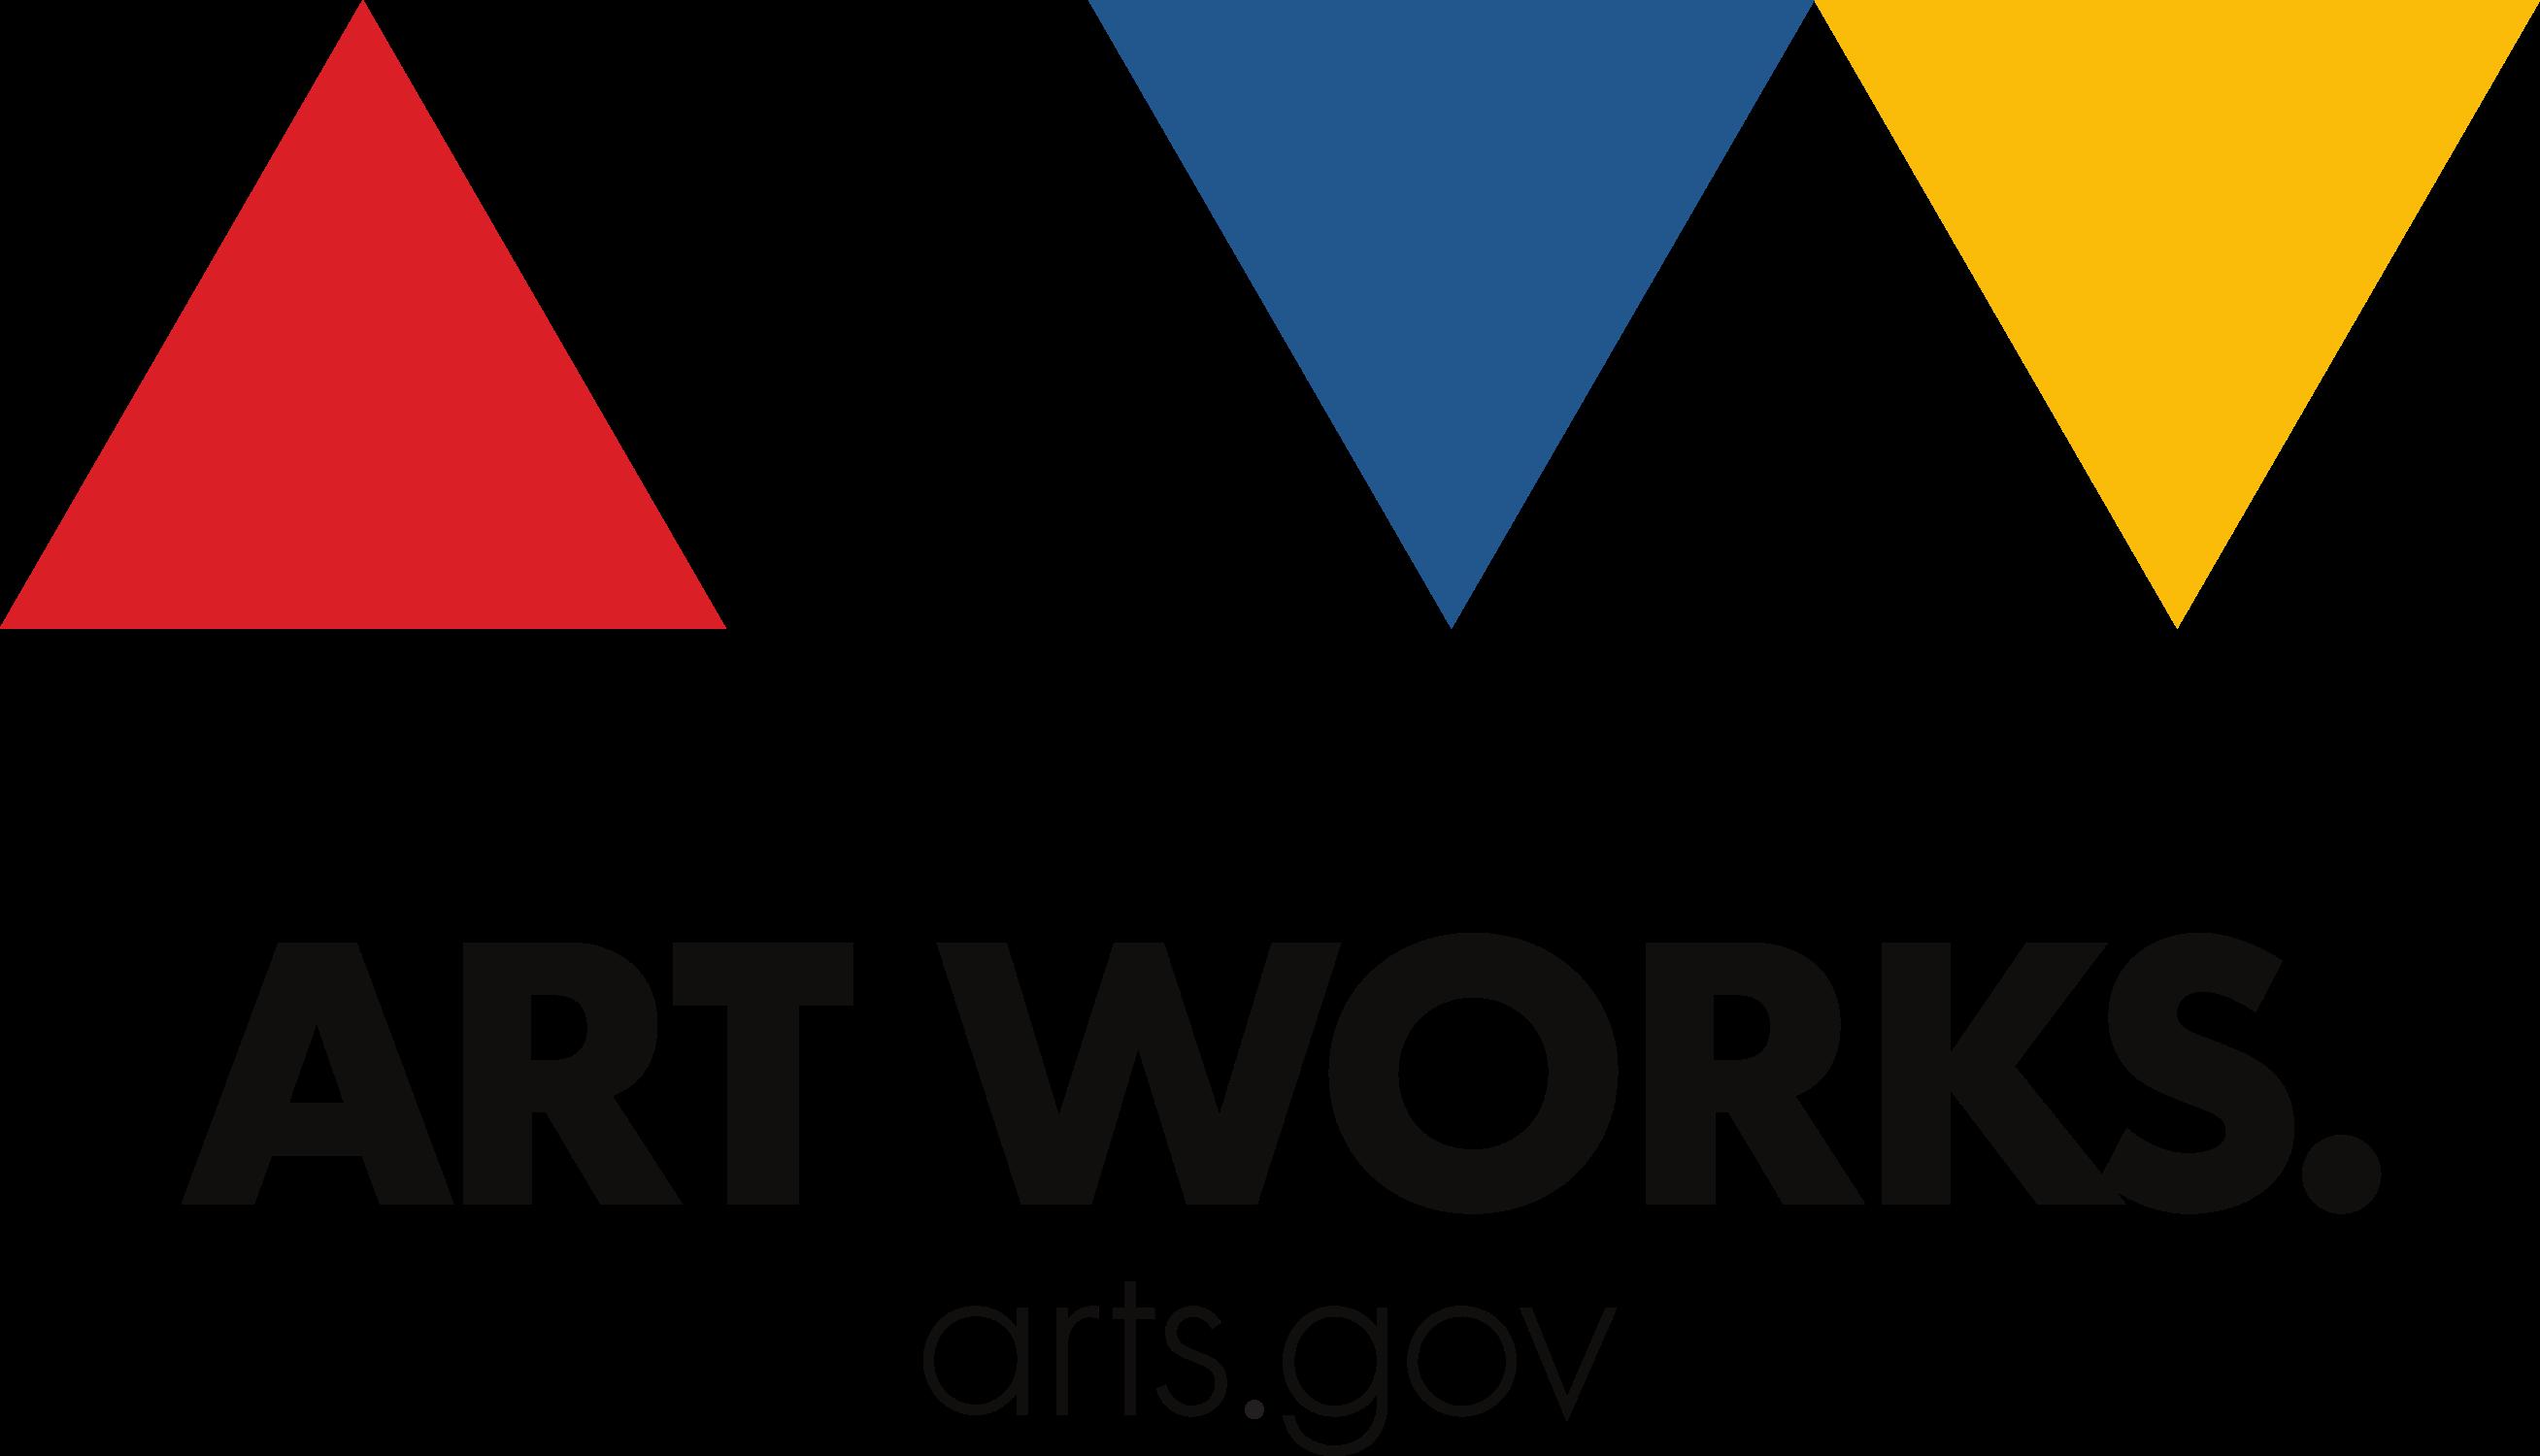 NEA-ArtWork